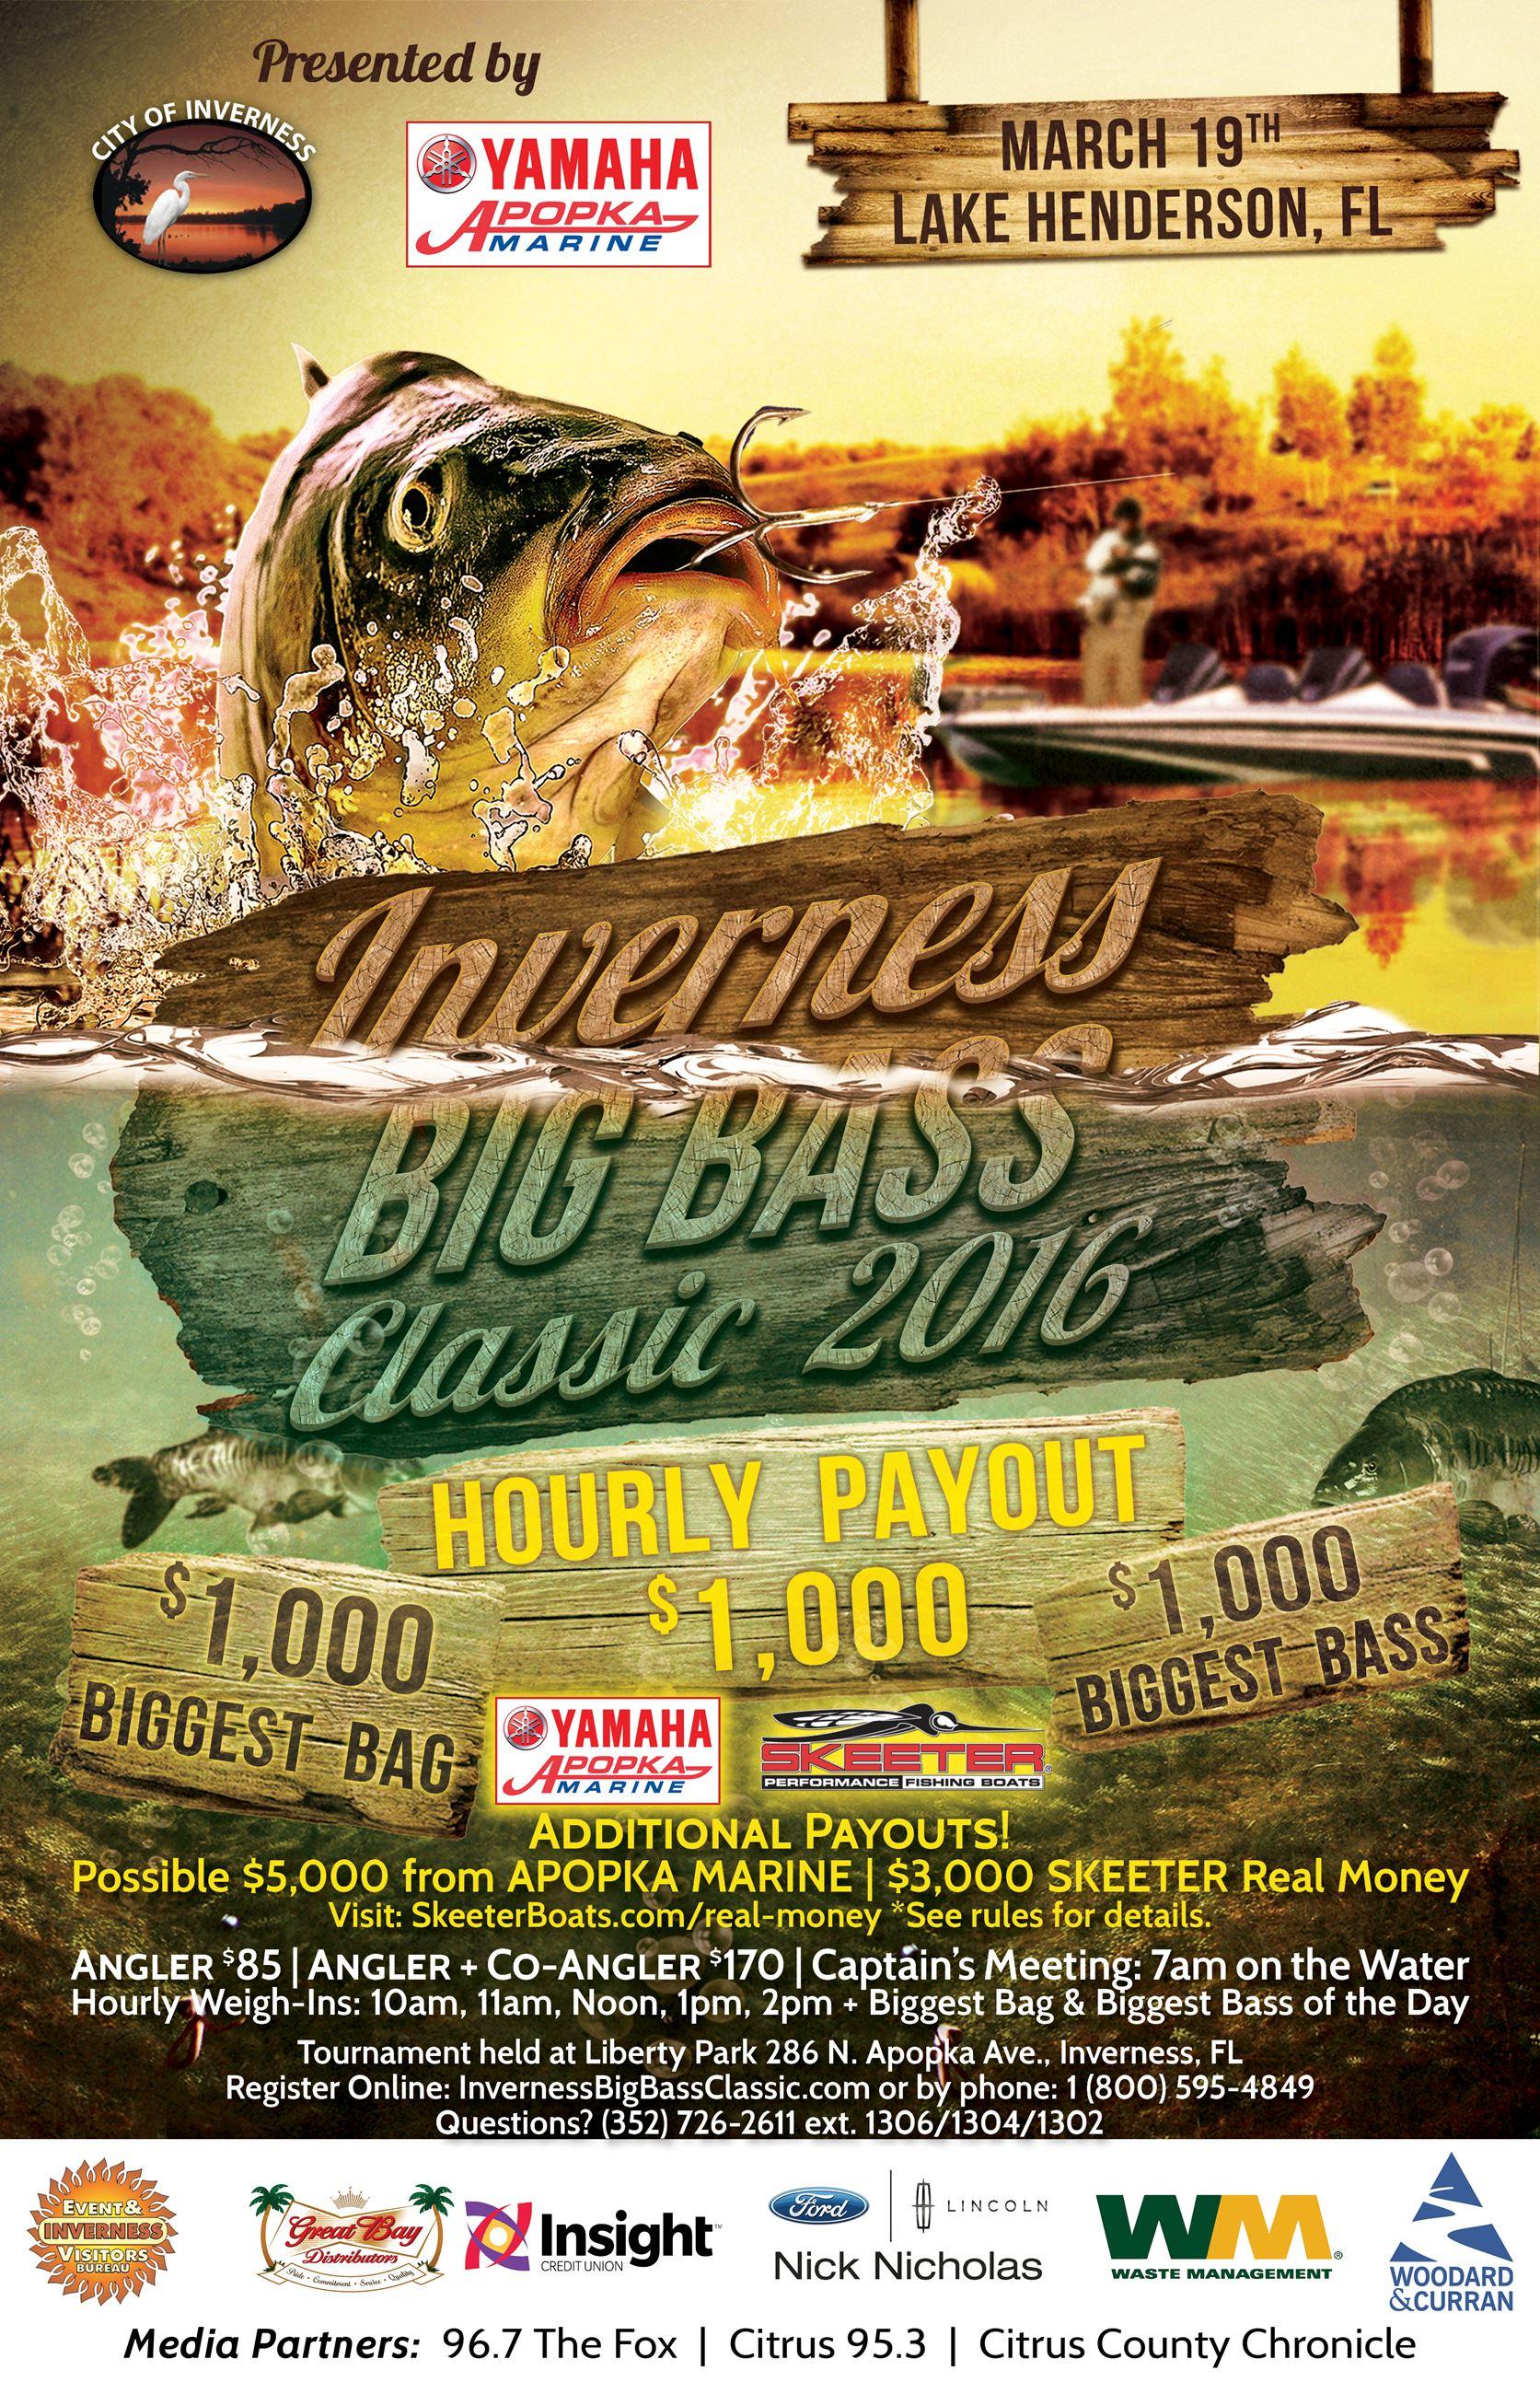 Inverness Big Bass Classic 2016